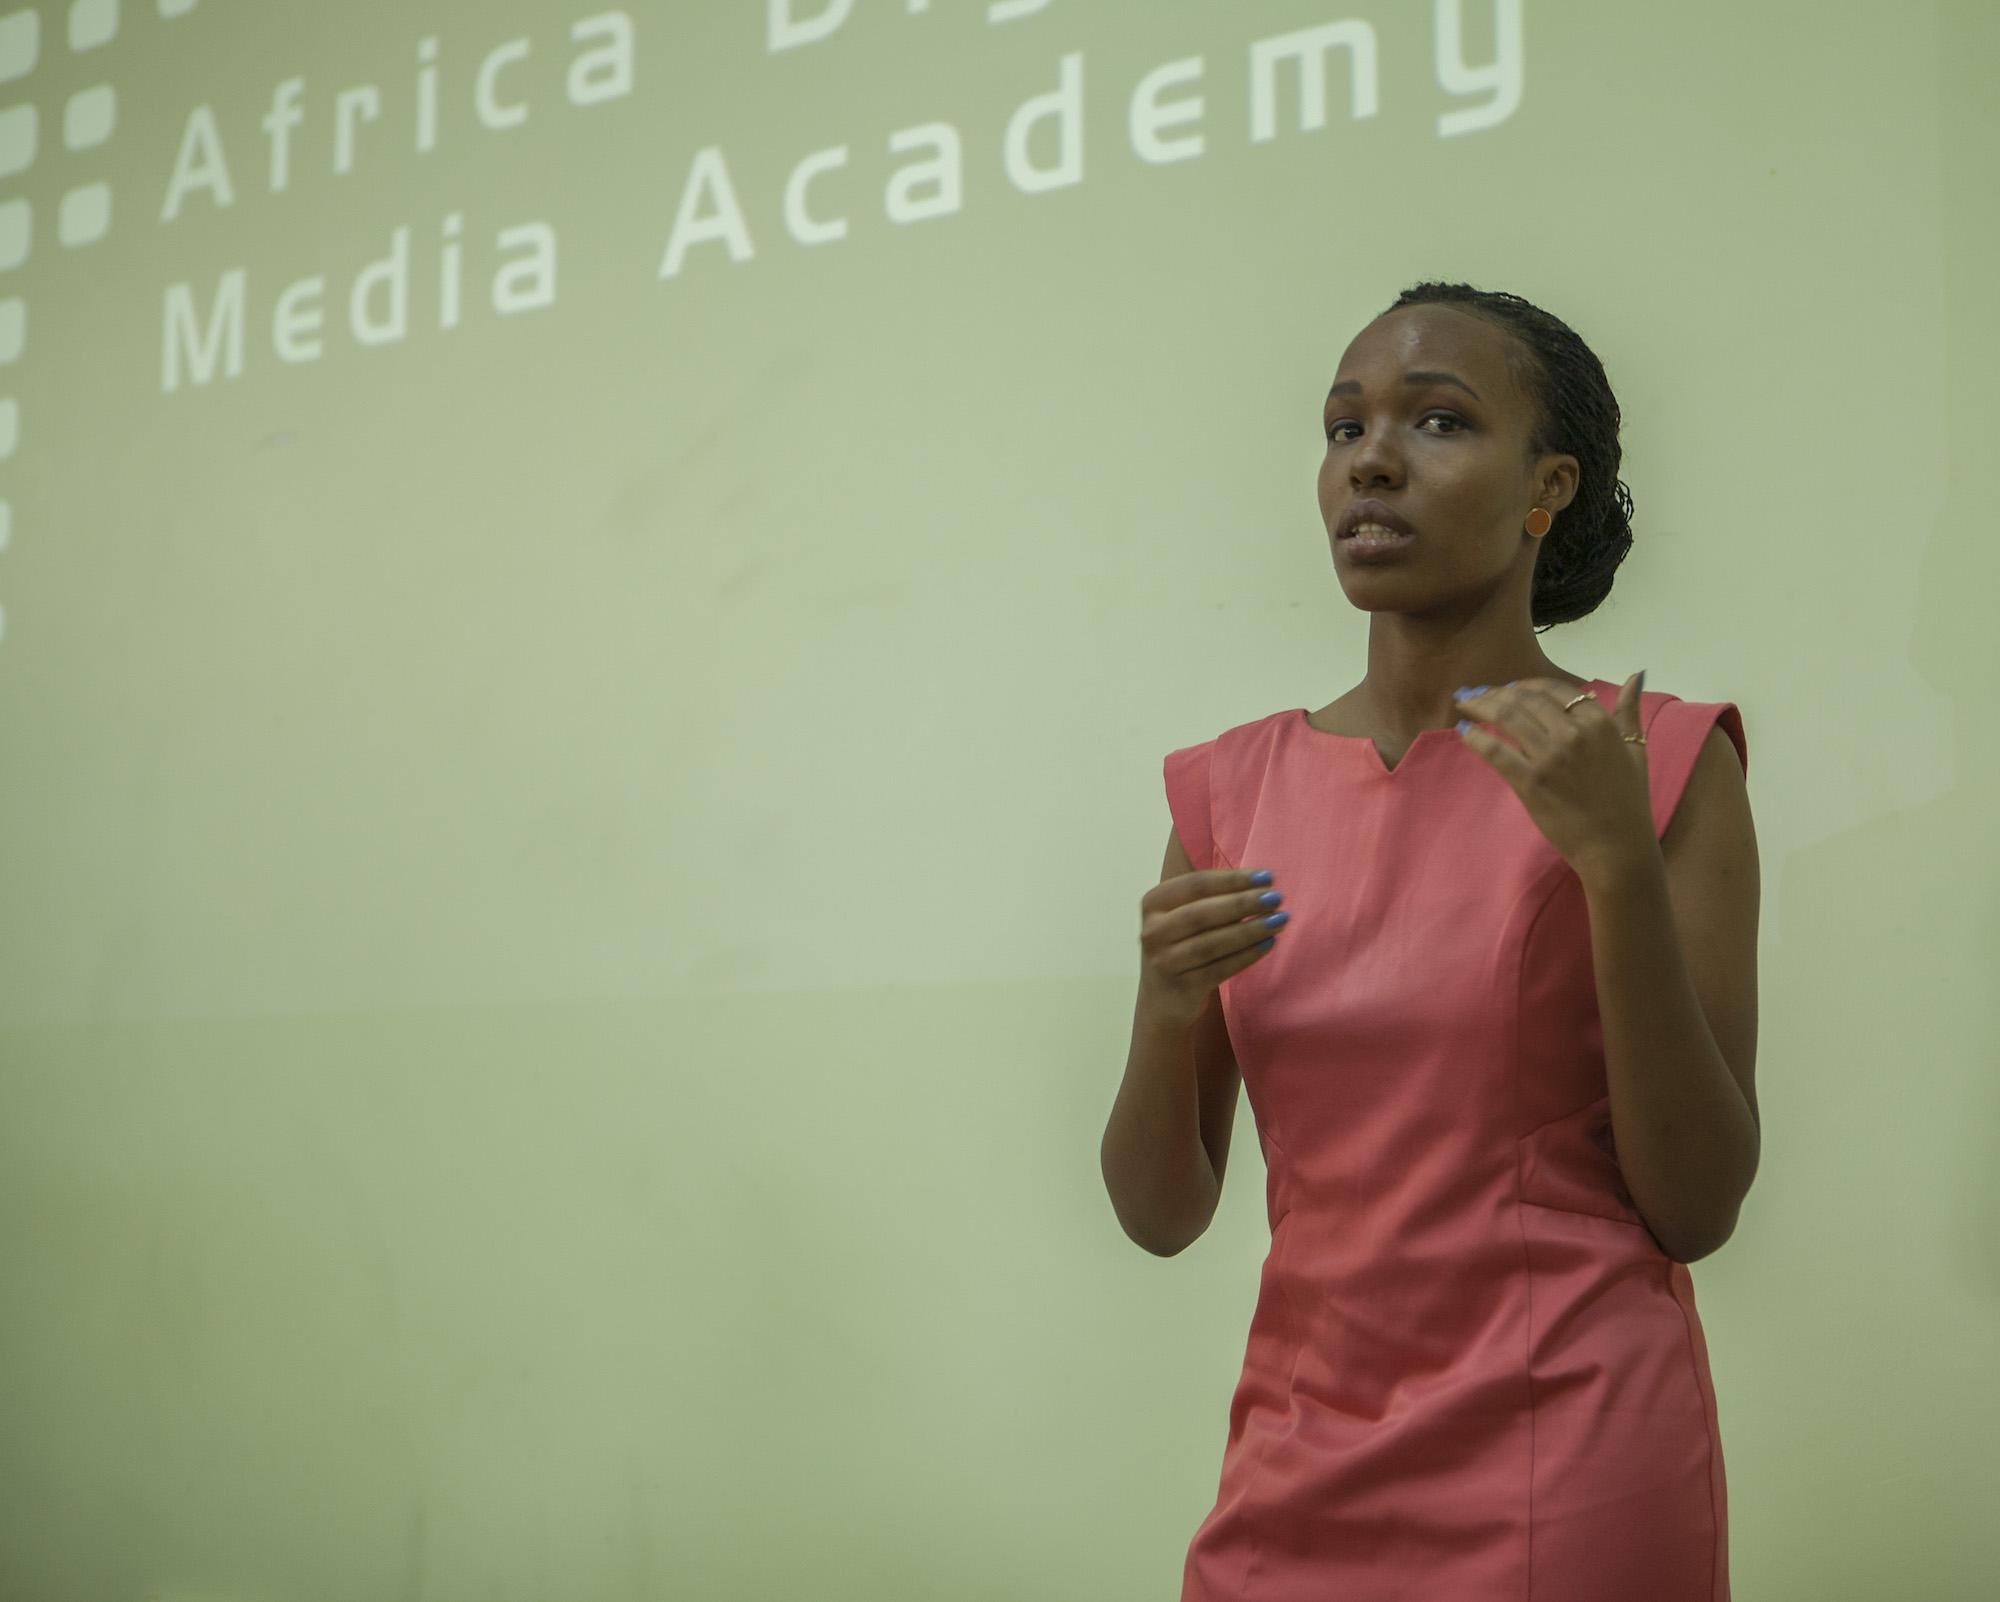 The Imbuto ADMA class selected Sharon Kalimba as their representative to speak at the graduation ceremony.